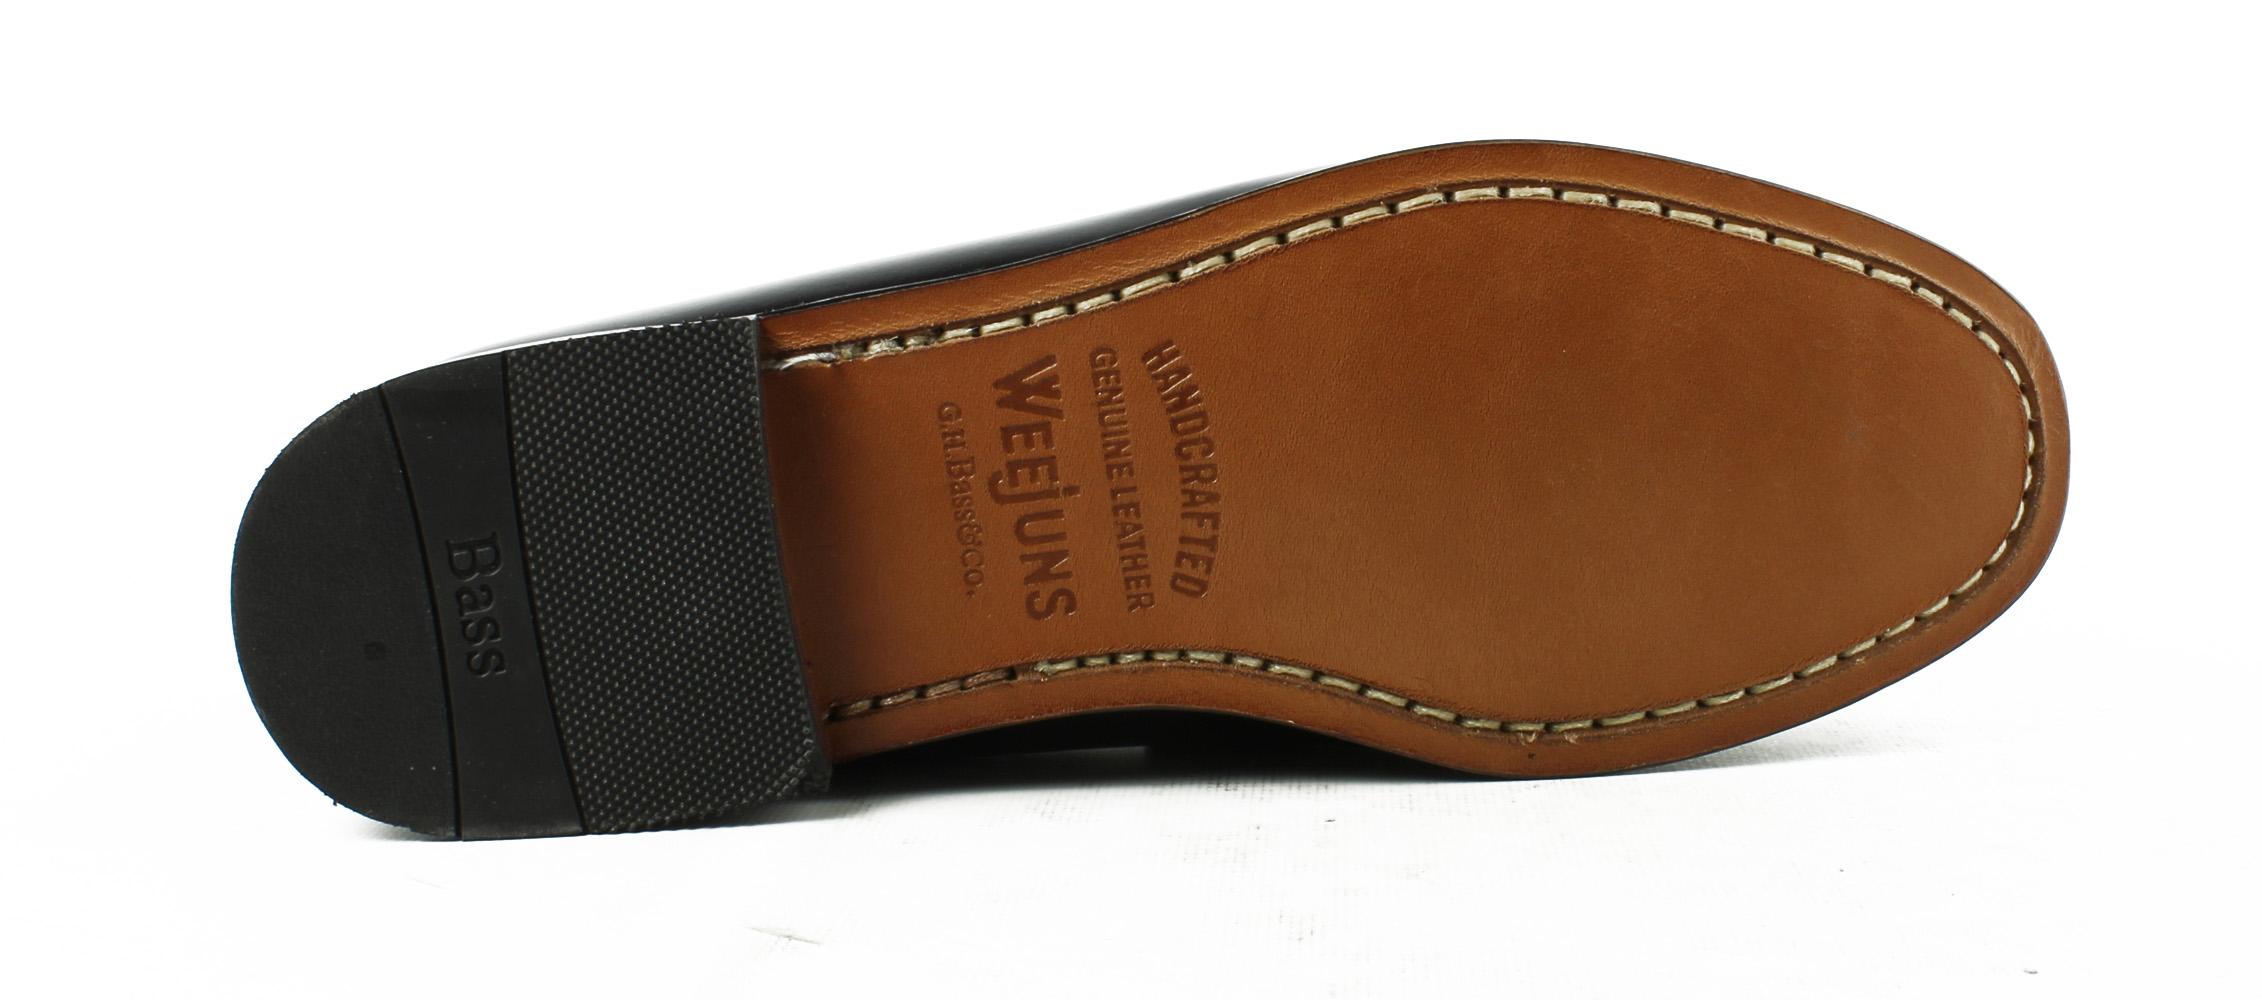 Diadora N-6100-3 W Economical, stylish, and eye-catching shoes